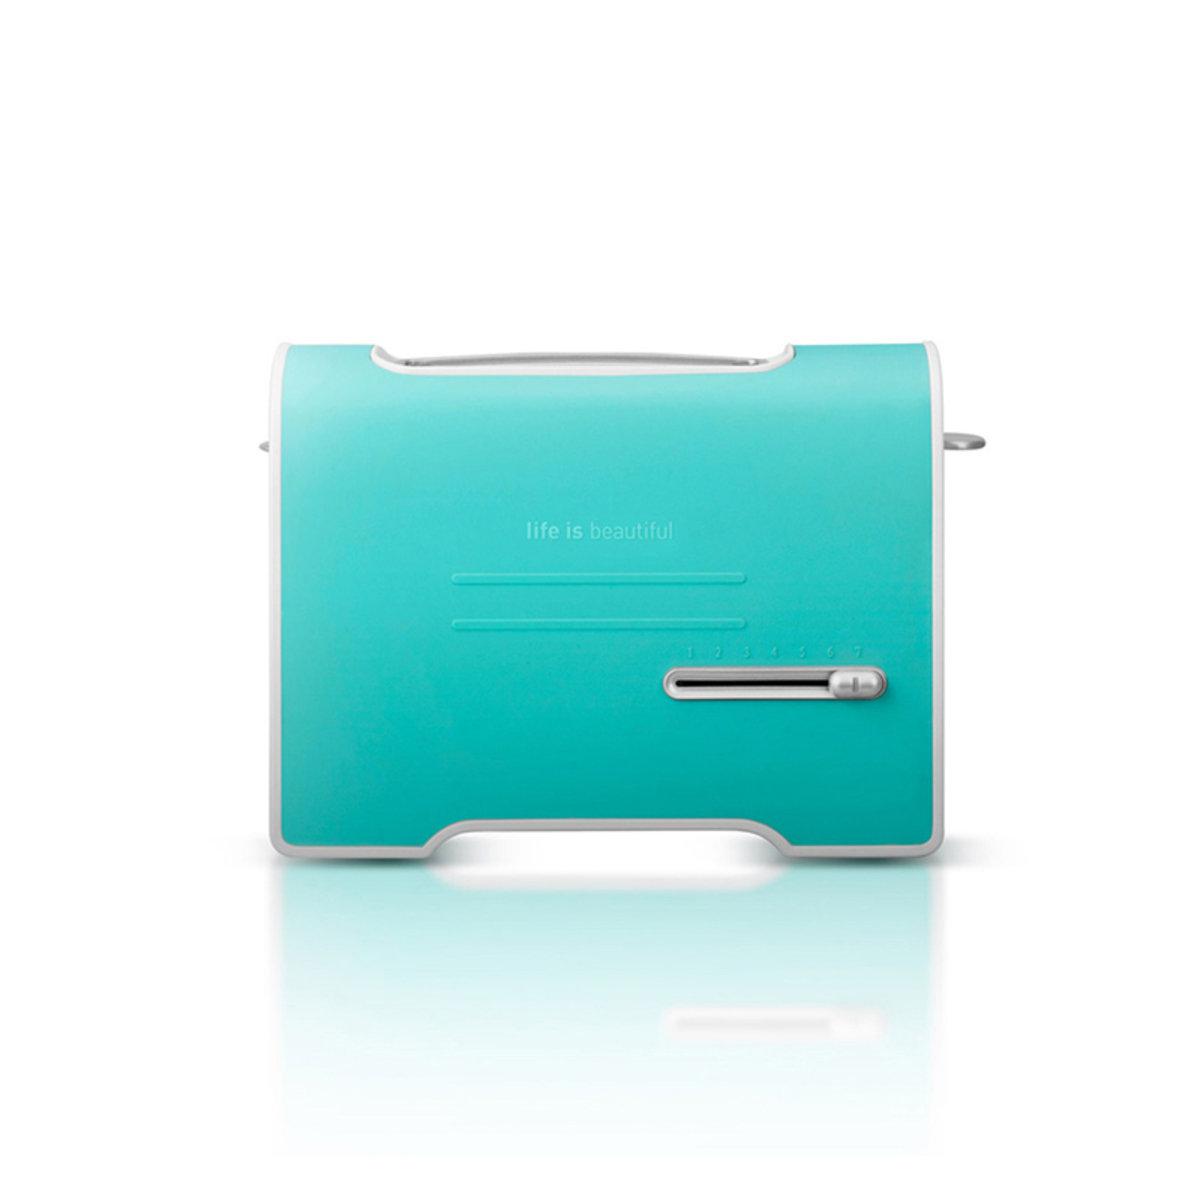 life is beautiful - JNC   Beautiful Kitchen Appliances - Toaster ...